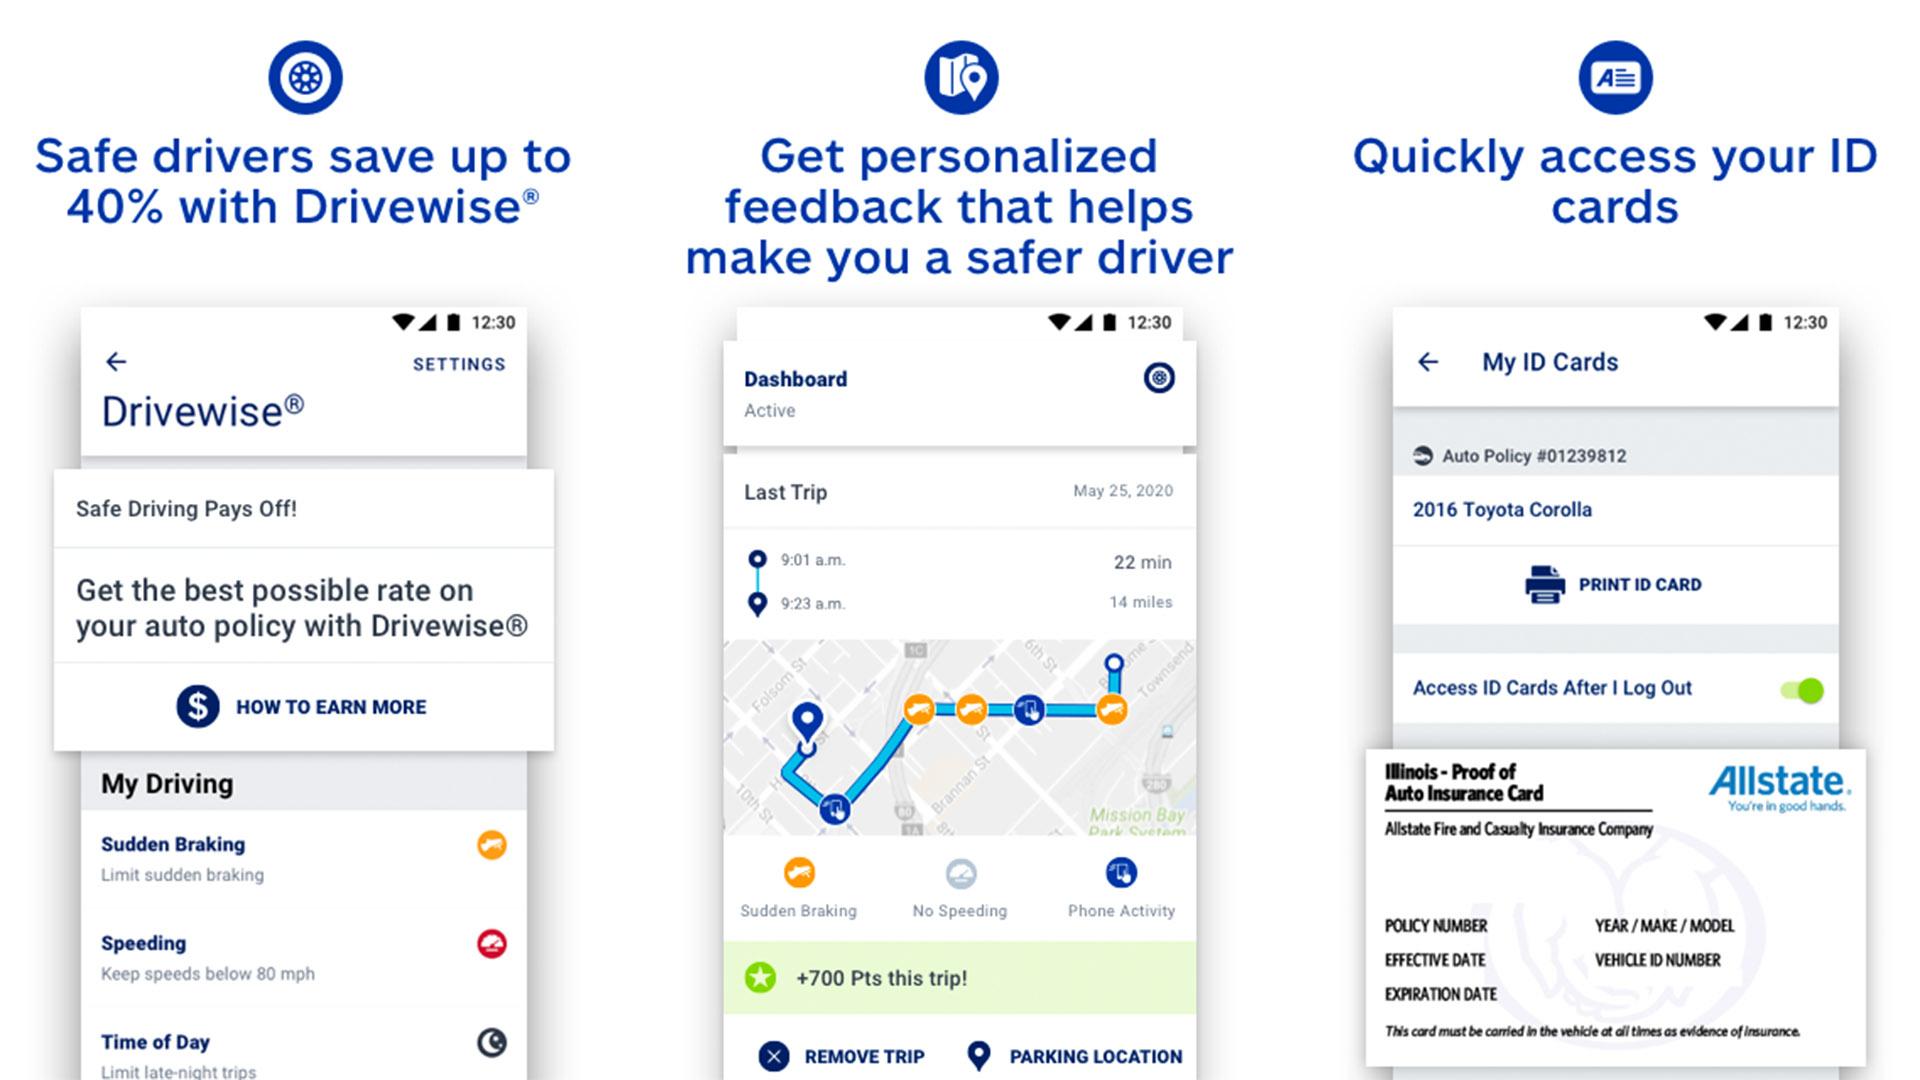 Allstate Mobile screenshot 2020